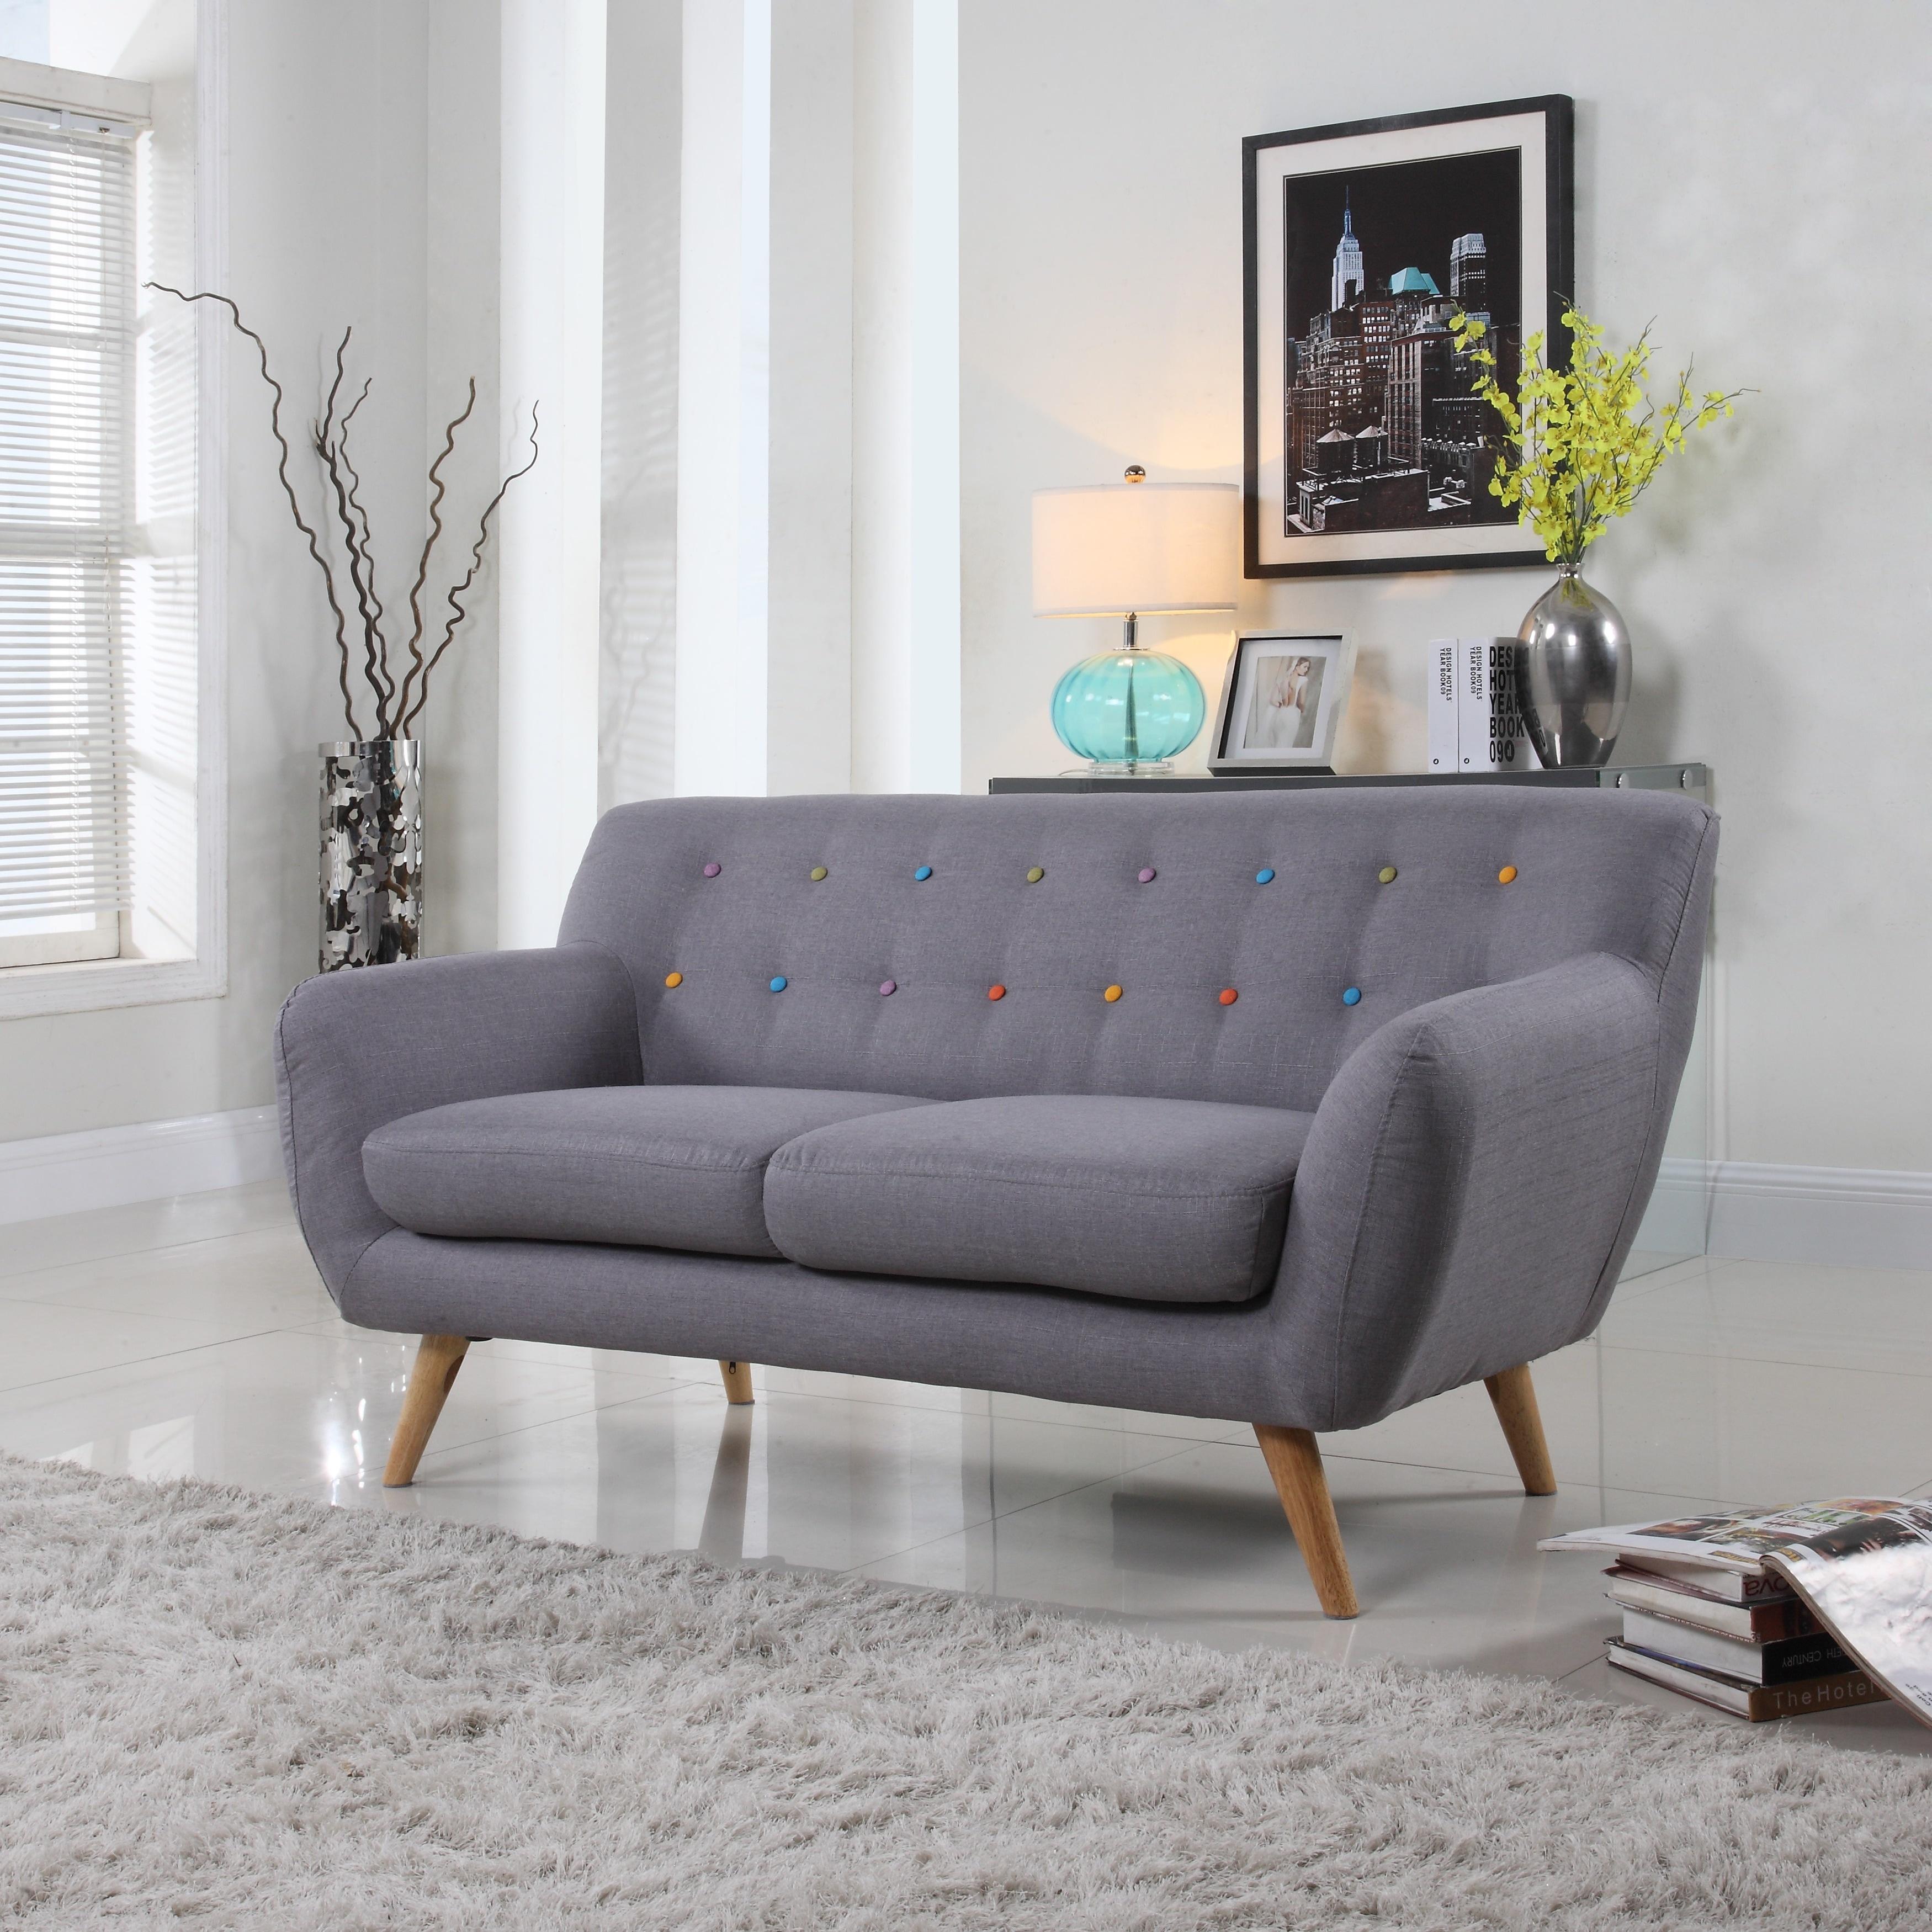 Mid Century Modern Love Seat Living Room Furniture Assorted  # Muebles Tagalog